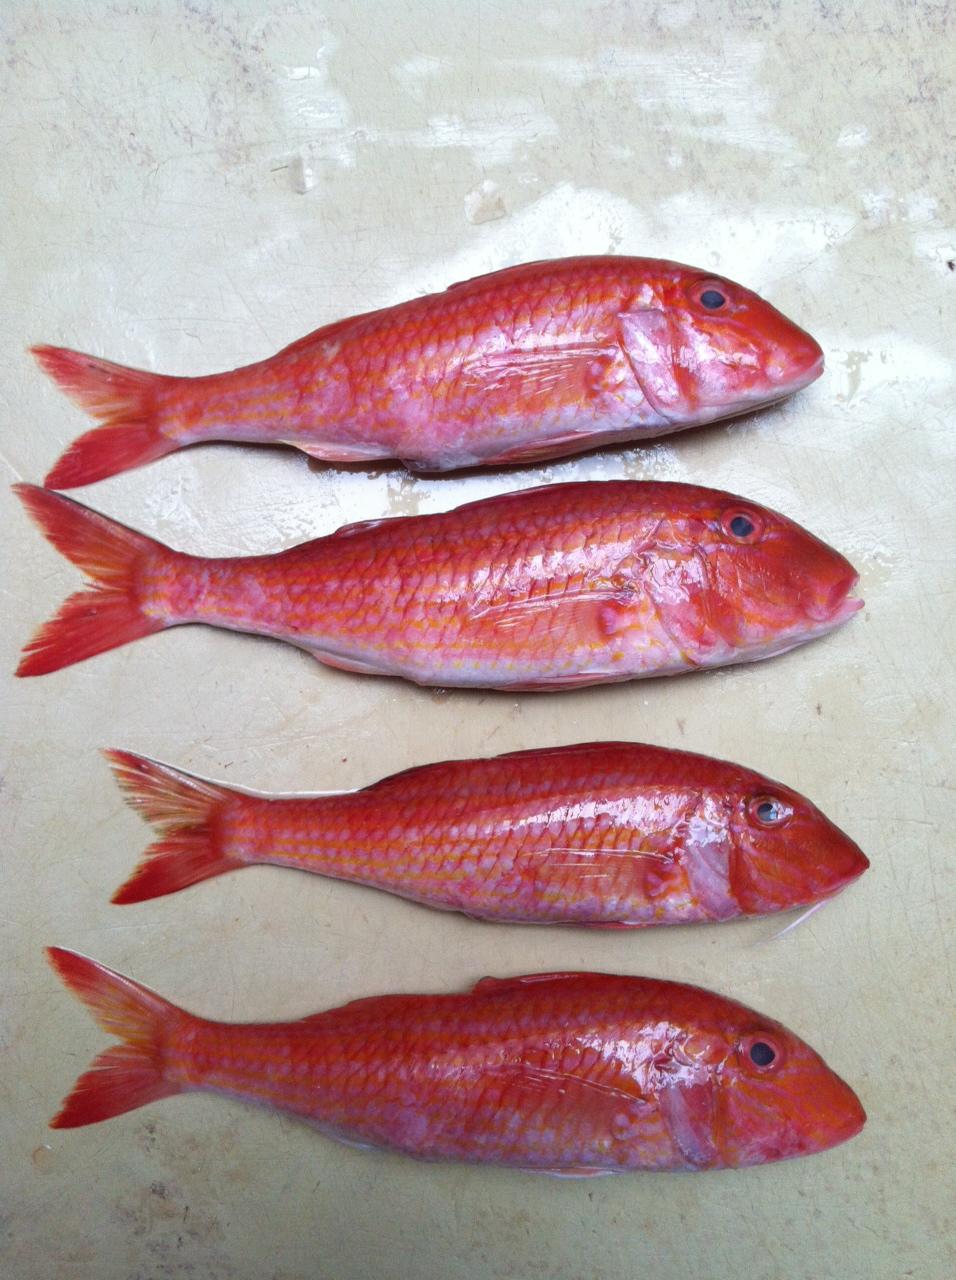 The edible ocean delicious little fish for Edible hawaiian fish